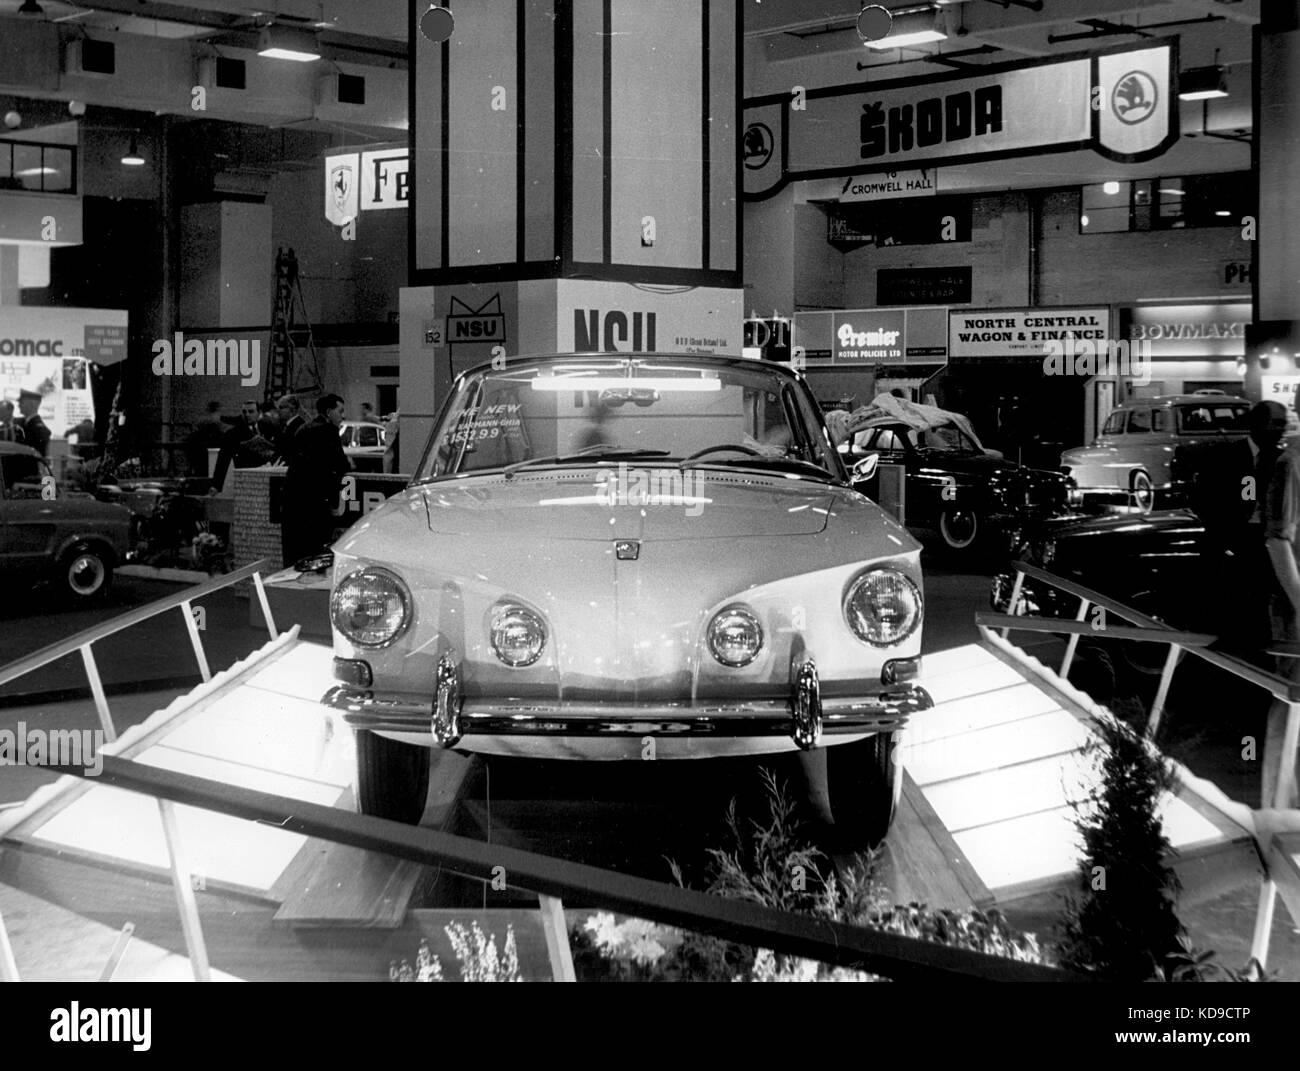 VW type 34 launch at 1961 Frankfurt motor show - Stock Image